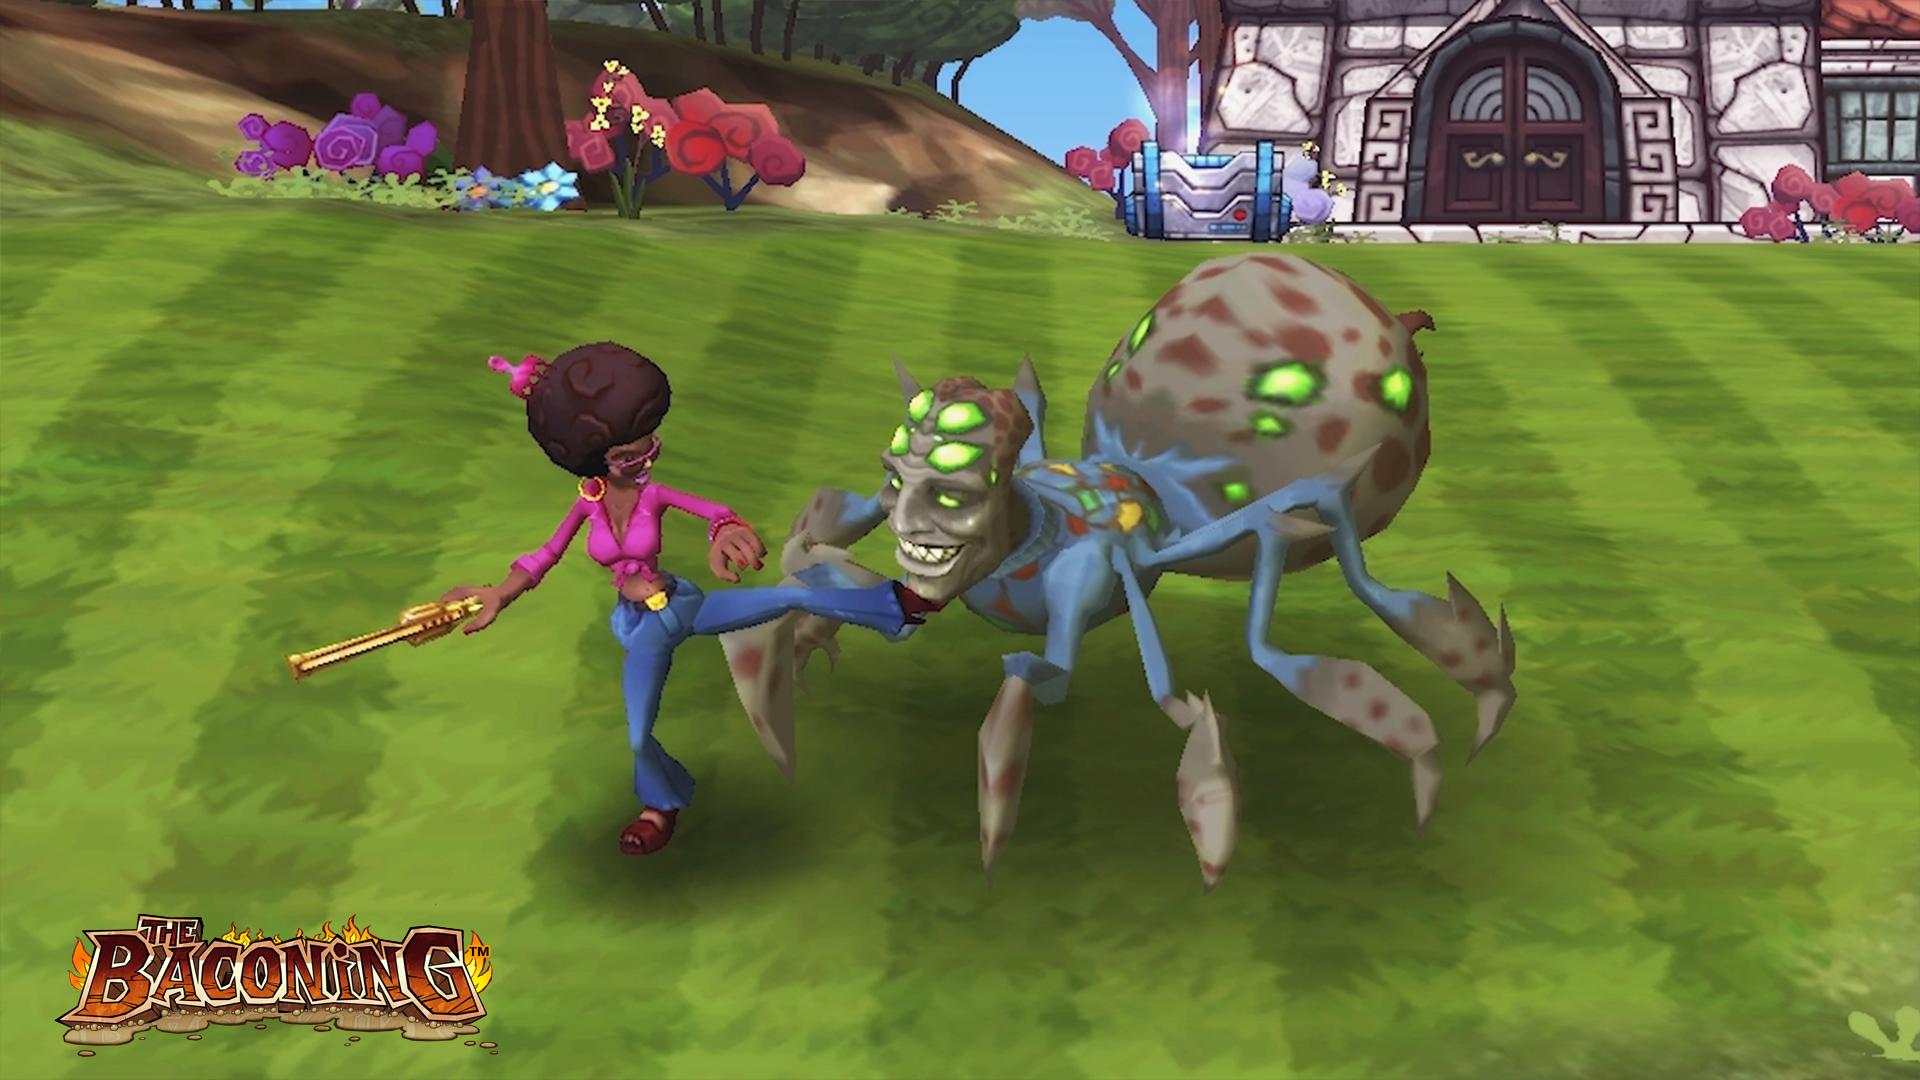 The Baconing DLC - Roesha – One Bad Mutha Co-op Character screenshot